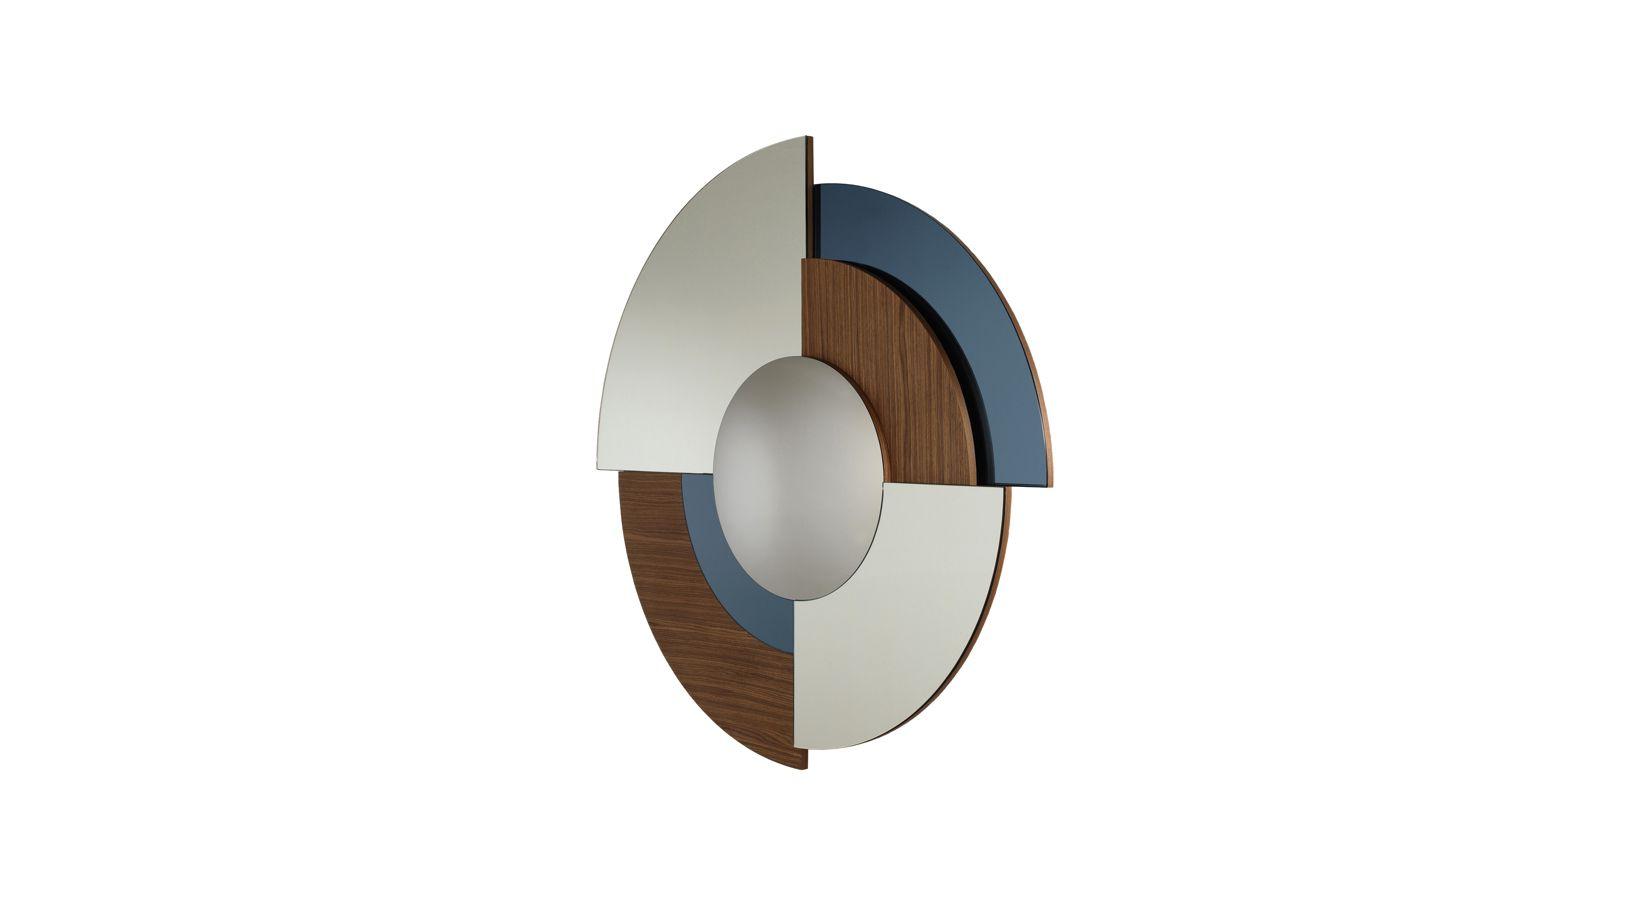 Merlin miroir roche bobois for Miroir design roche bobois